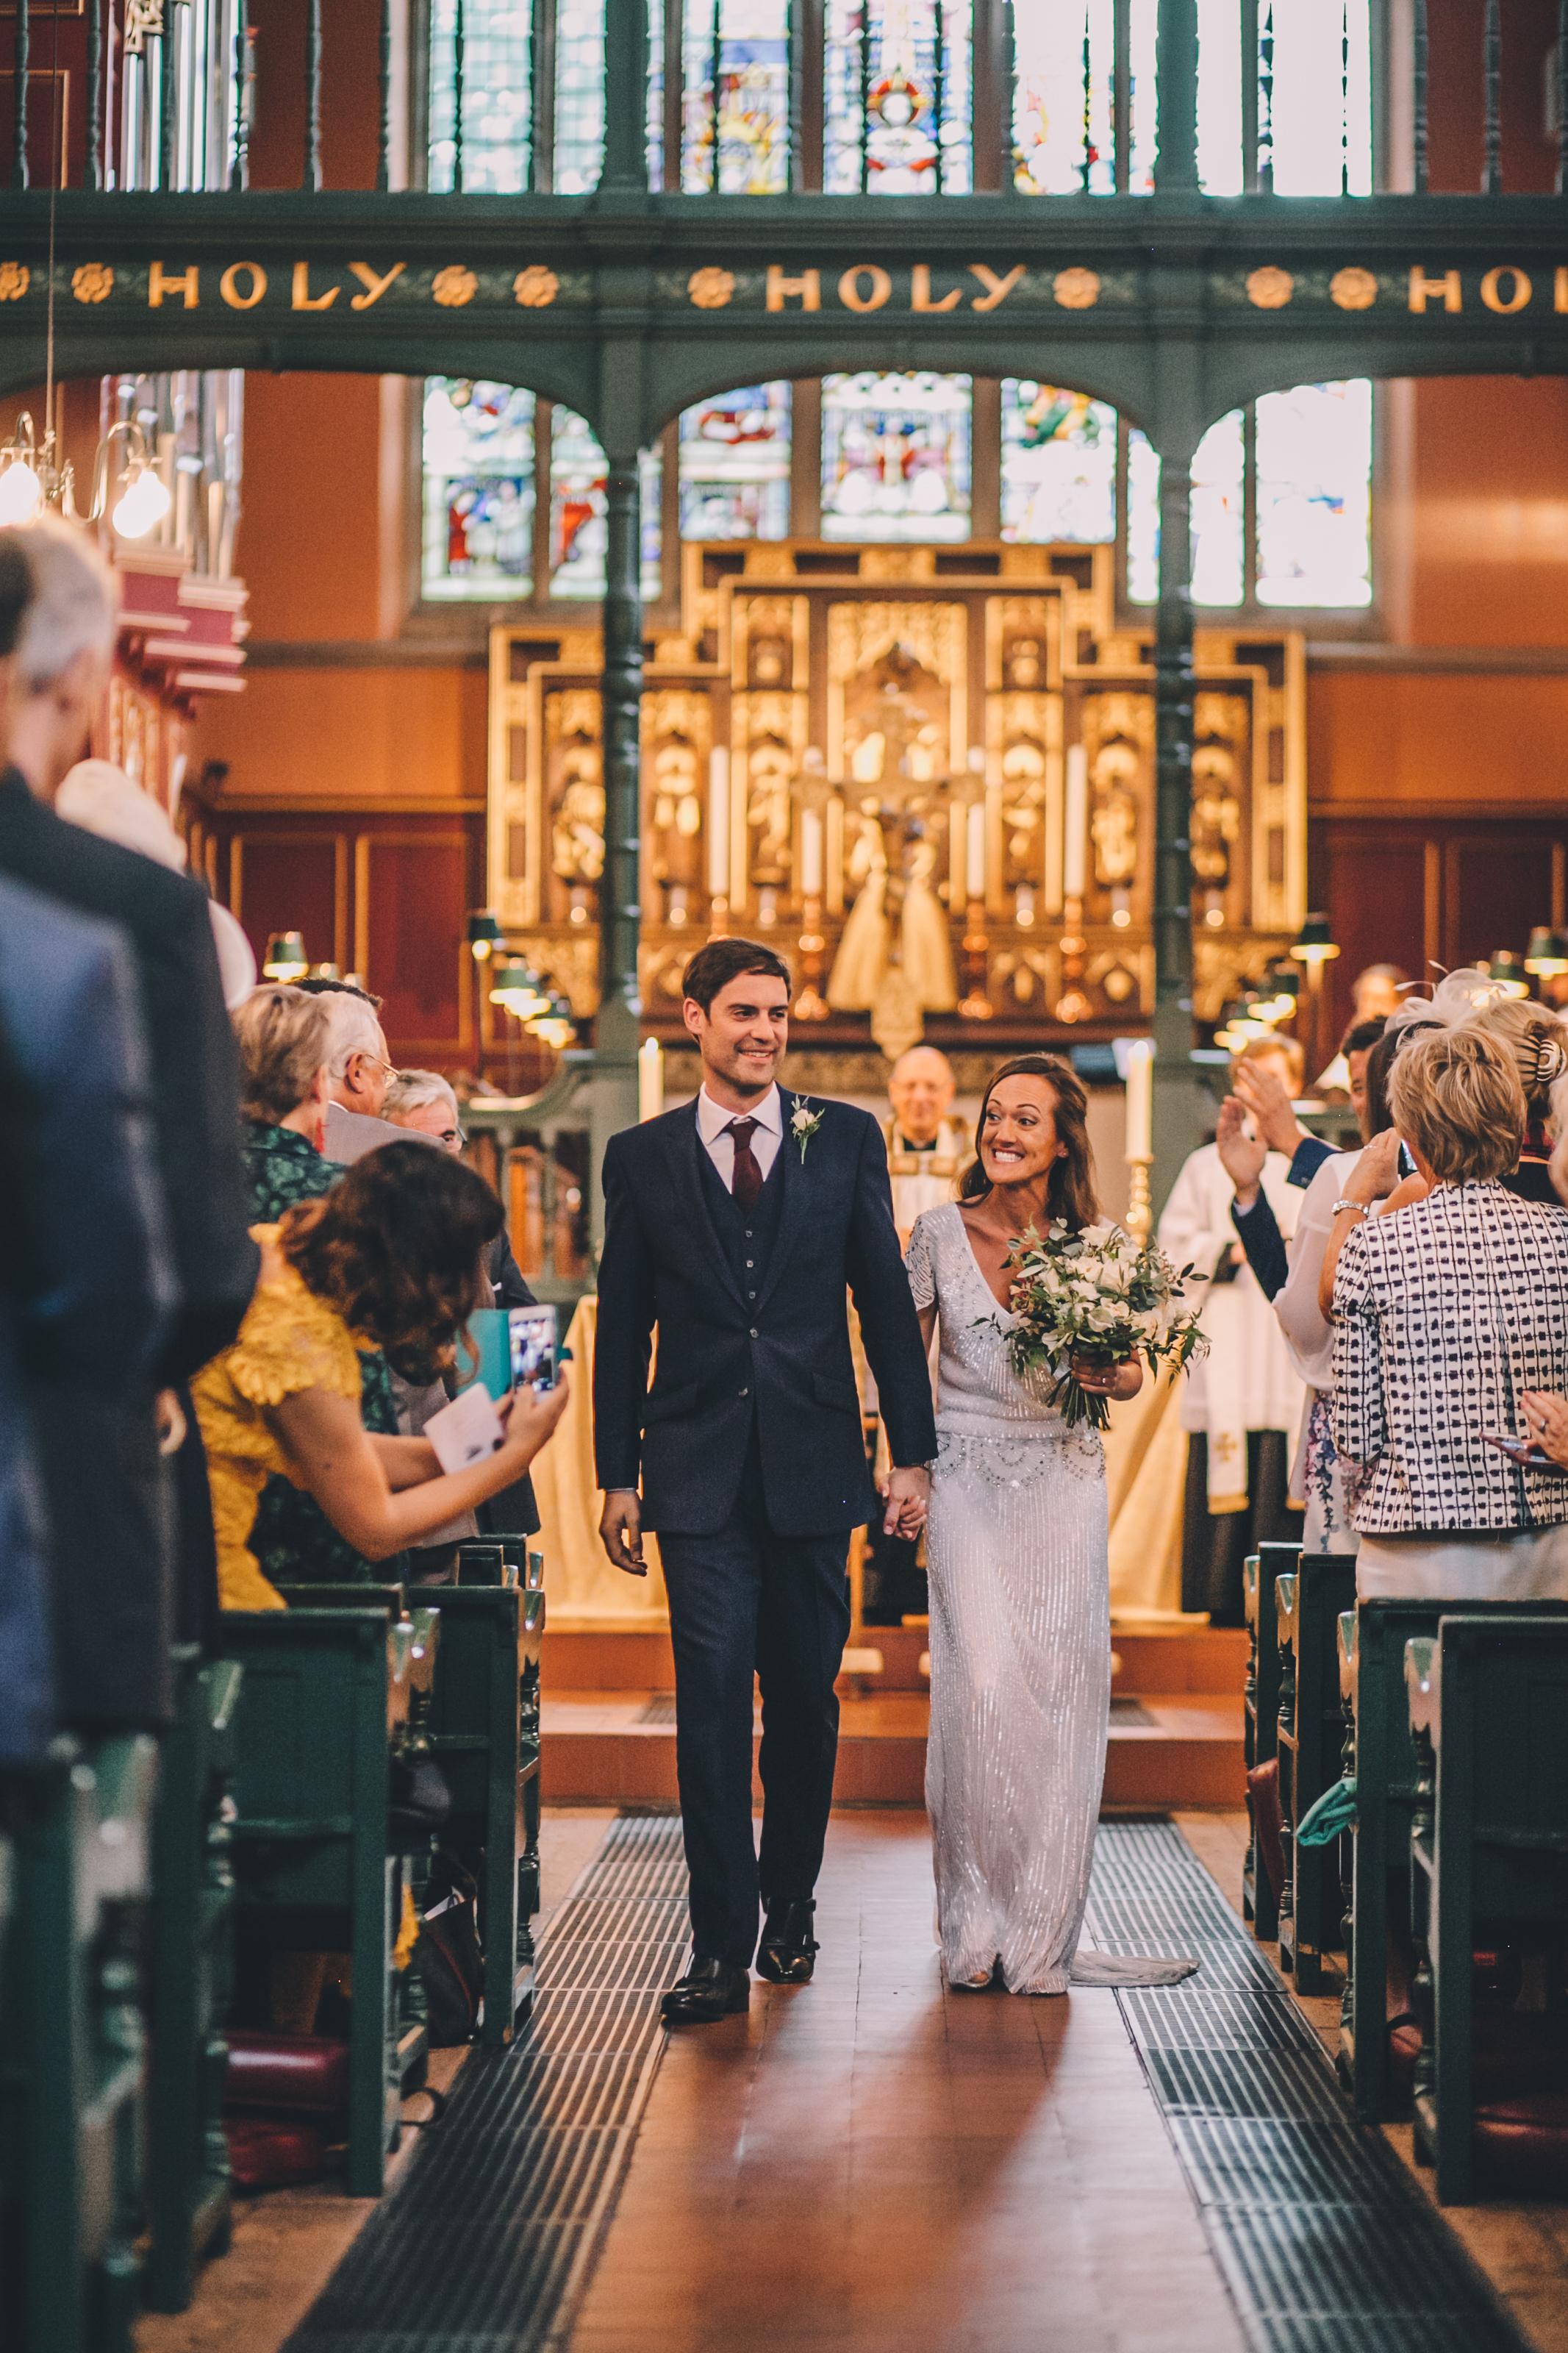 wedding-three-piece-suit-susannah-hall-tailor-british-bespoke-brook-taverner.jpg